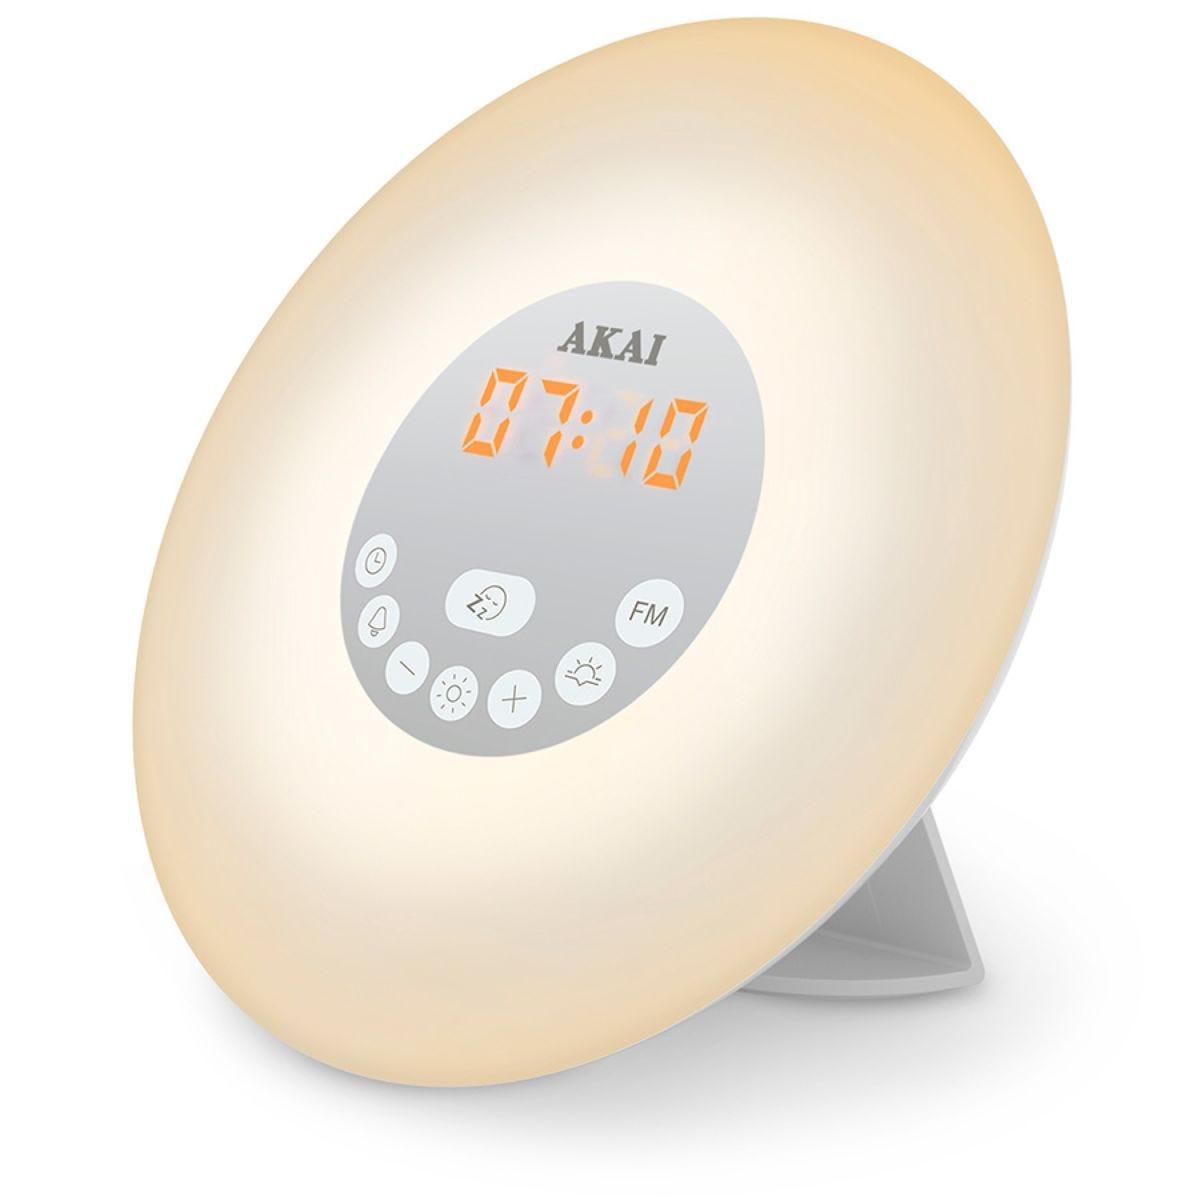 AKAI Wake-Up Alarm Clock Radio